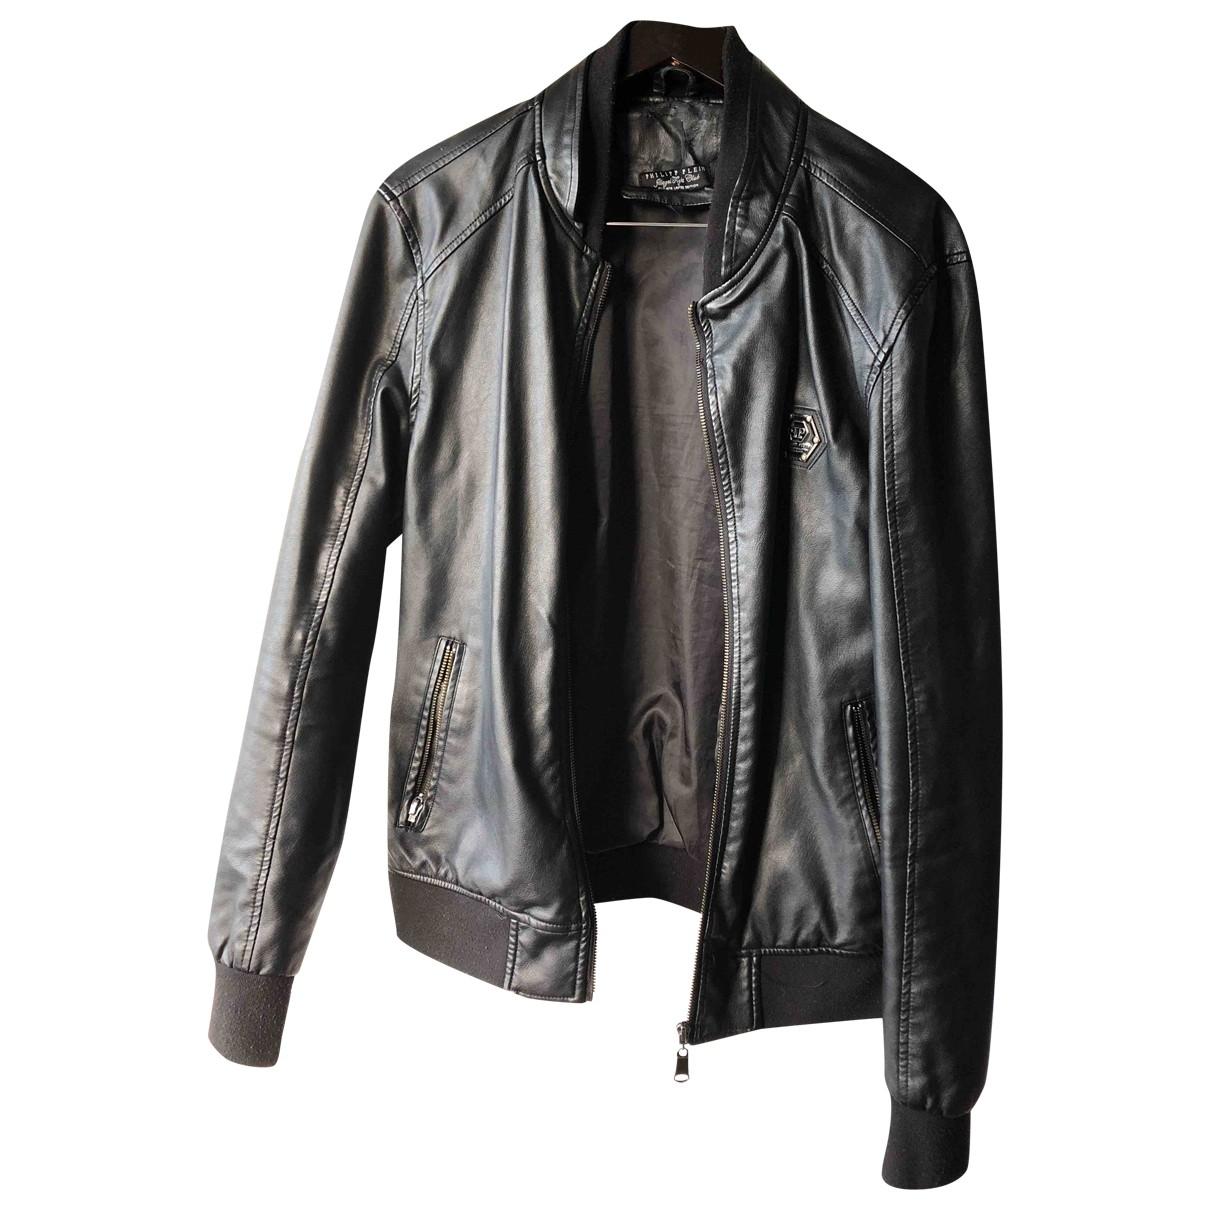 Philipp Plein \N Black Leather jacket  for Men L International